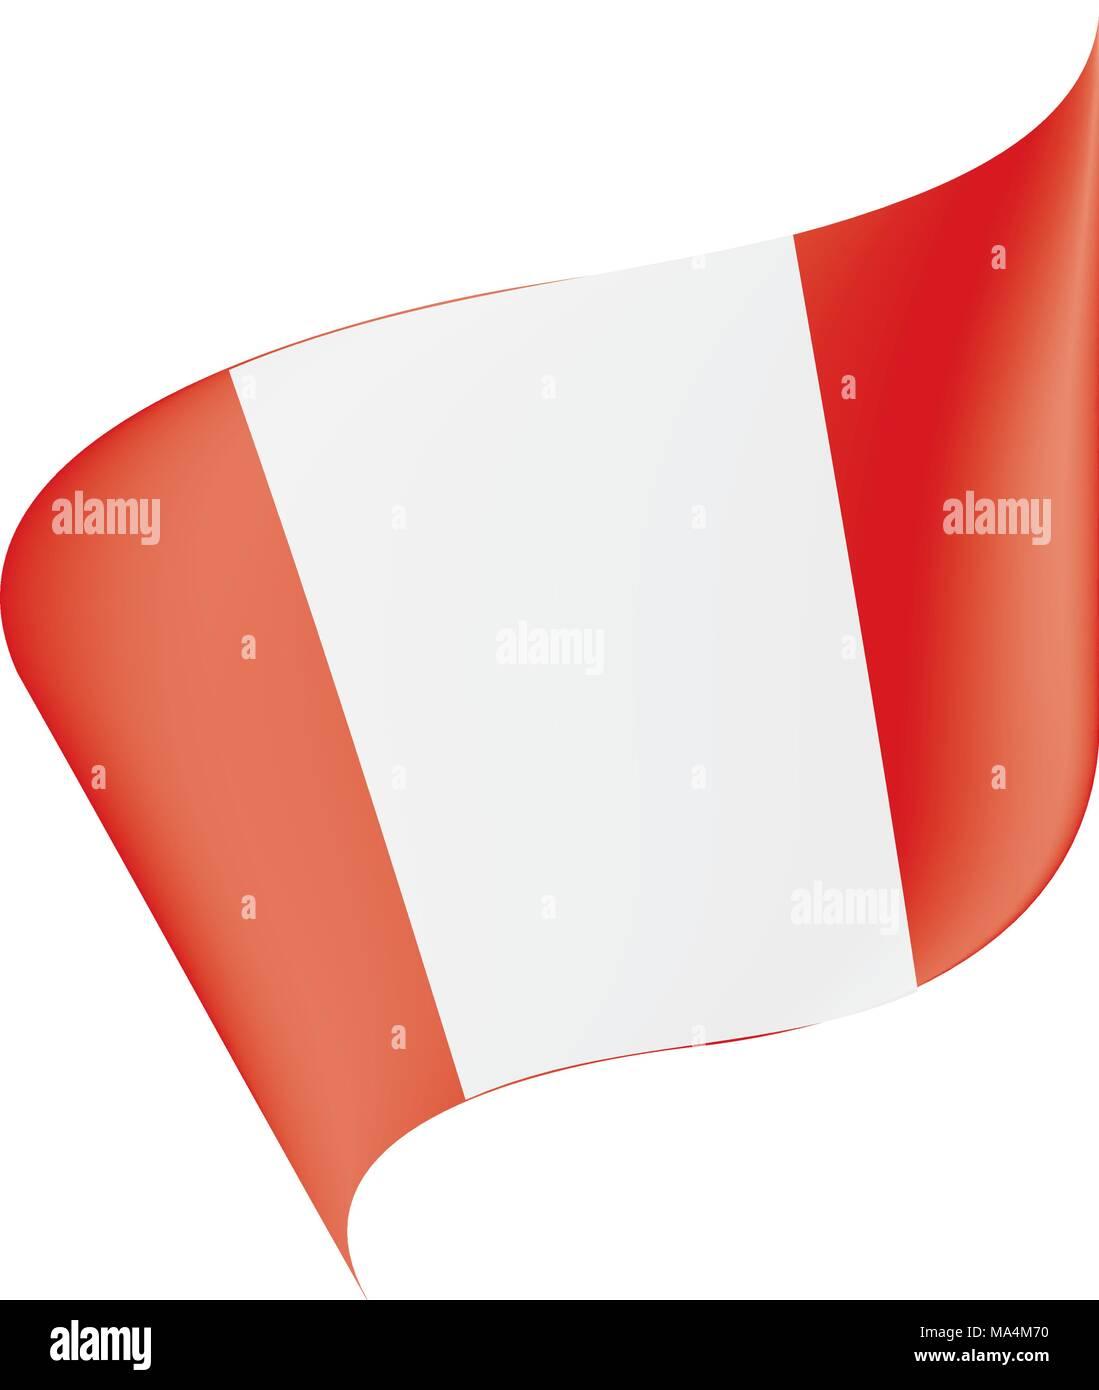 Großzügig Puerto Rico Flagge Färbung Seite Galerie - Entry Level ...